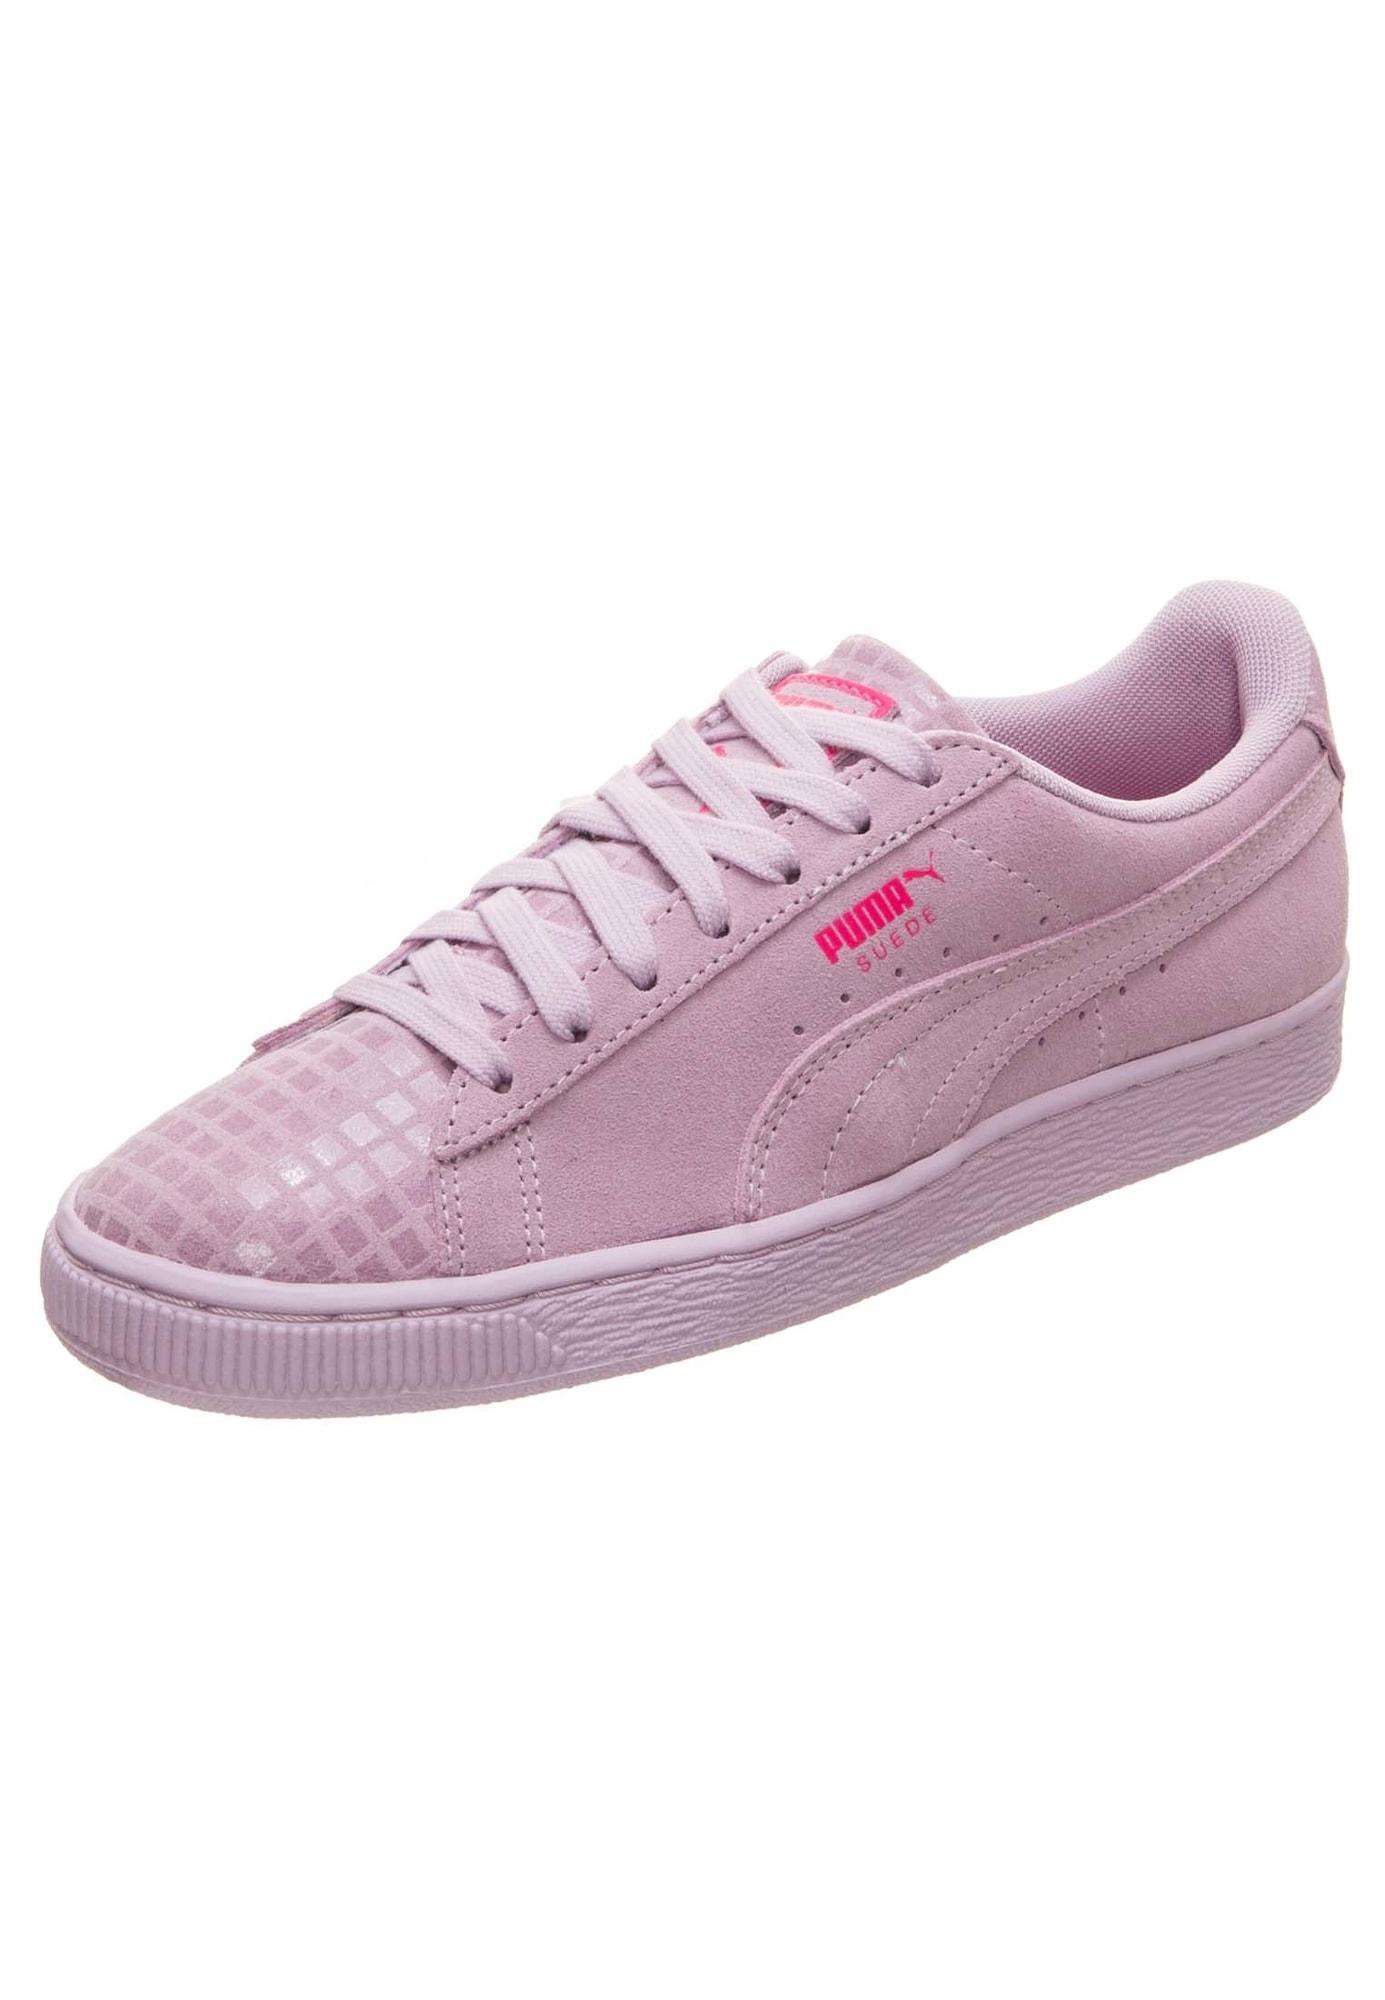 14765a8bde7 puma Puma Dames Sneakers Laag Suede Classic Street Lila puma kopen in de  aanbieding